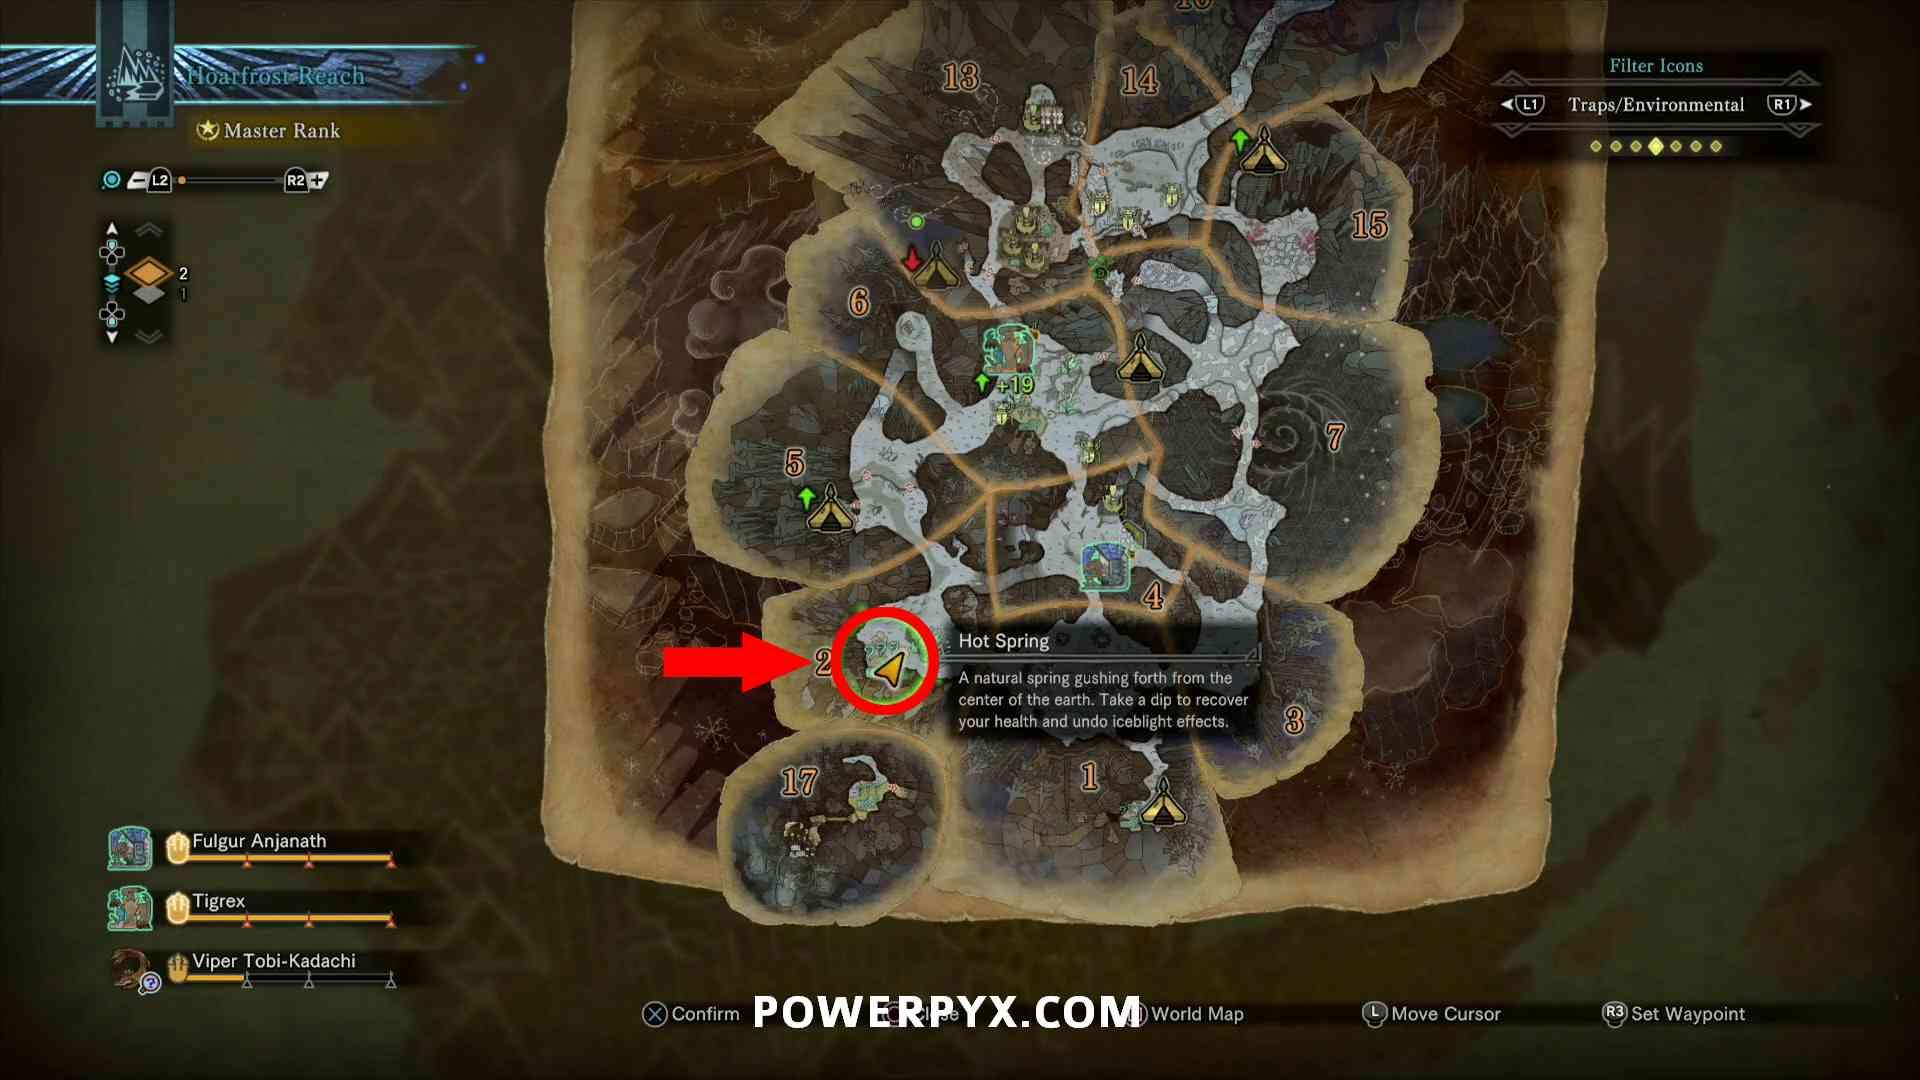 Monster Hunter World Iceborne Trophy Guide Roadmap Shara ishvalda parts broken /13. monster hunter world iceborne trophy